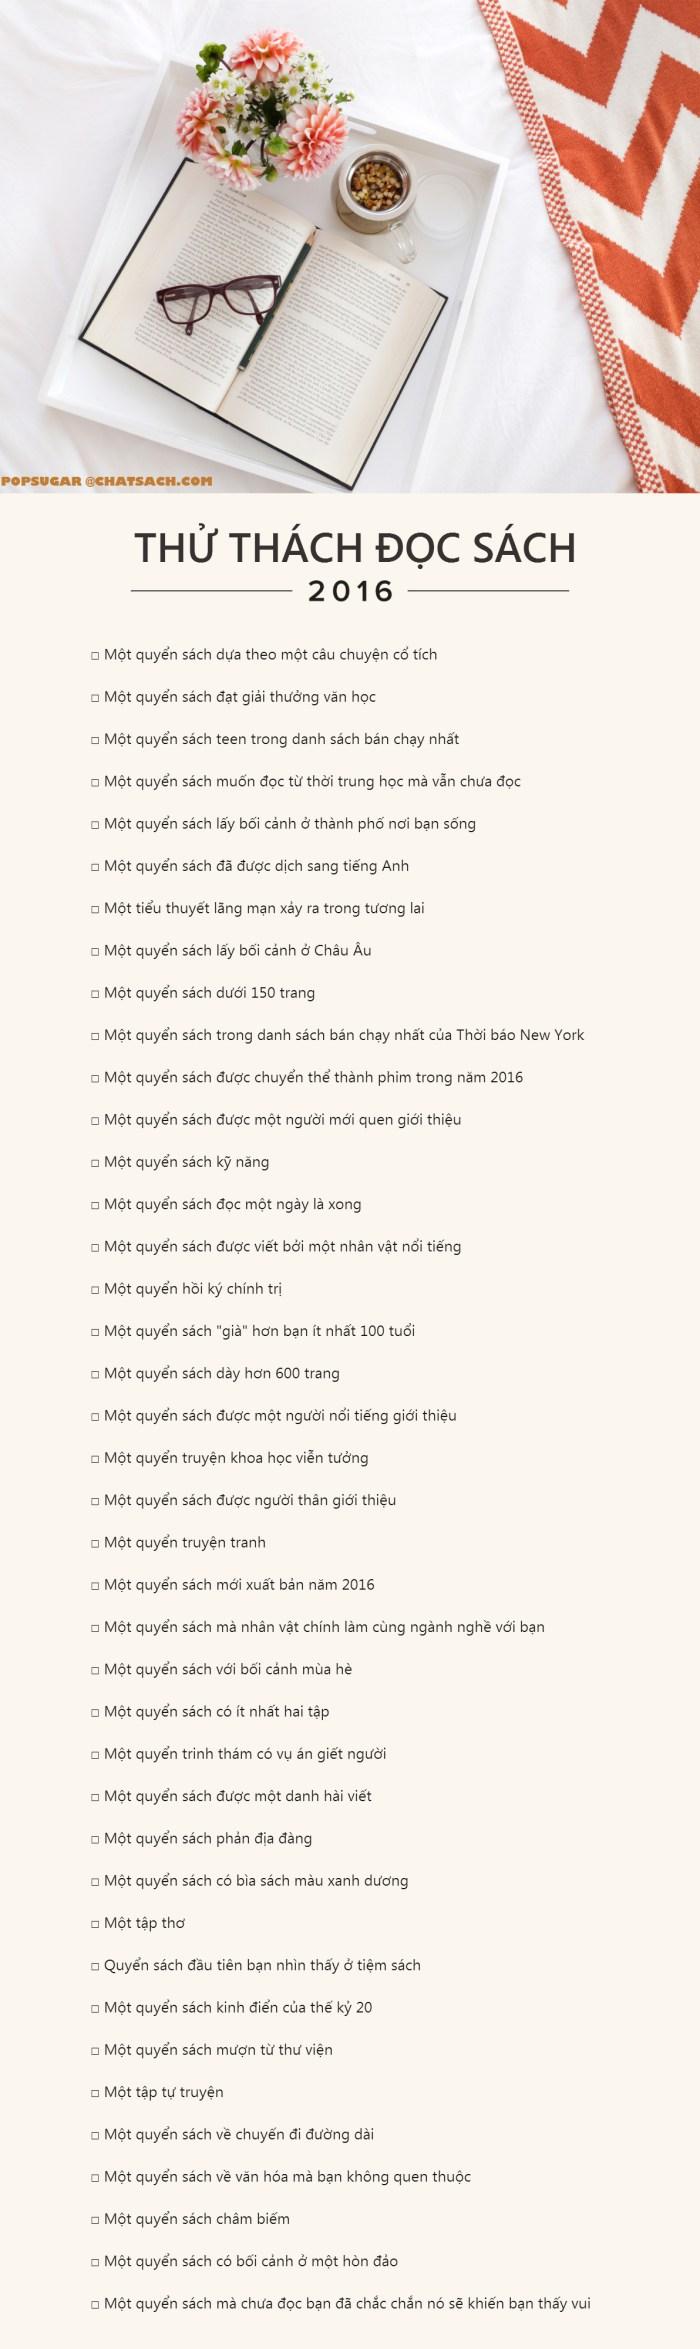 2016 reading challenge_vnm_chatsach2